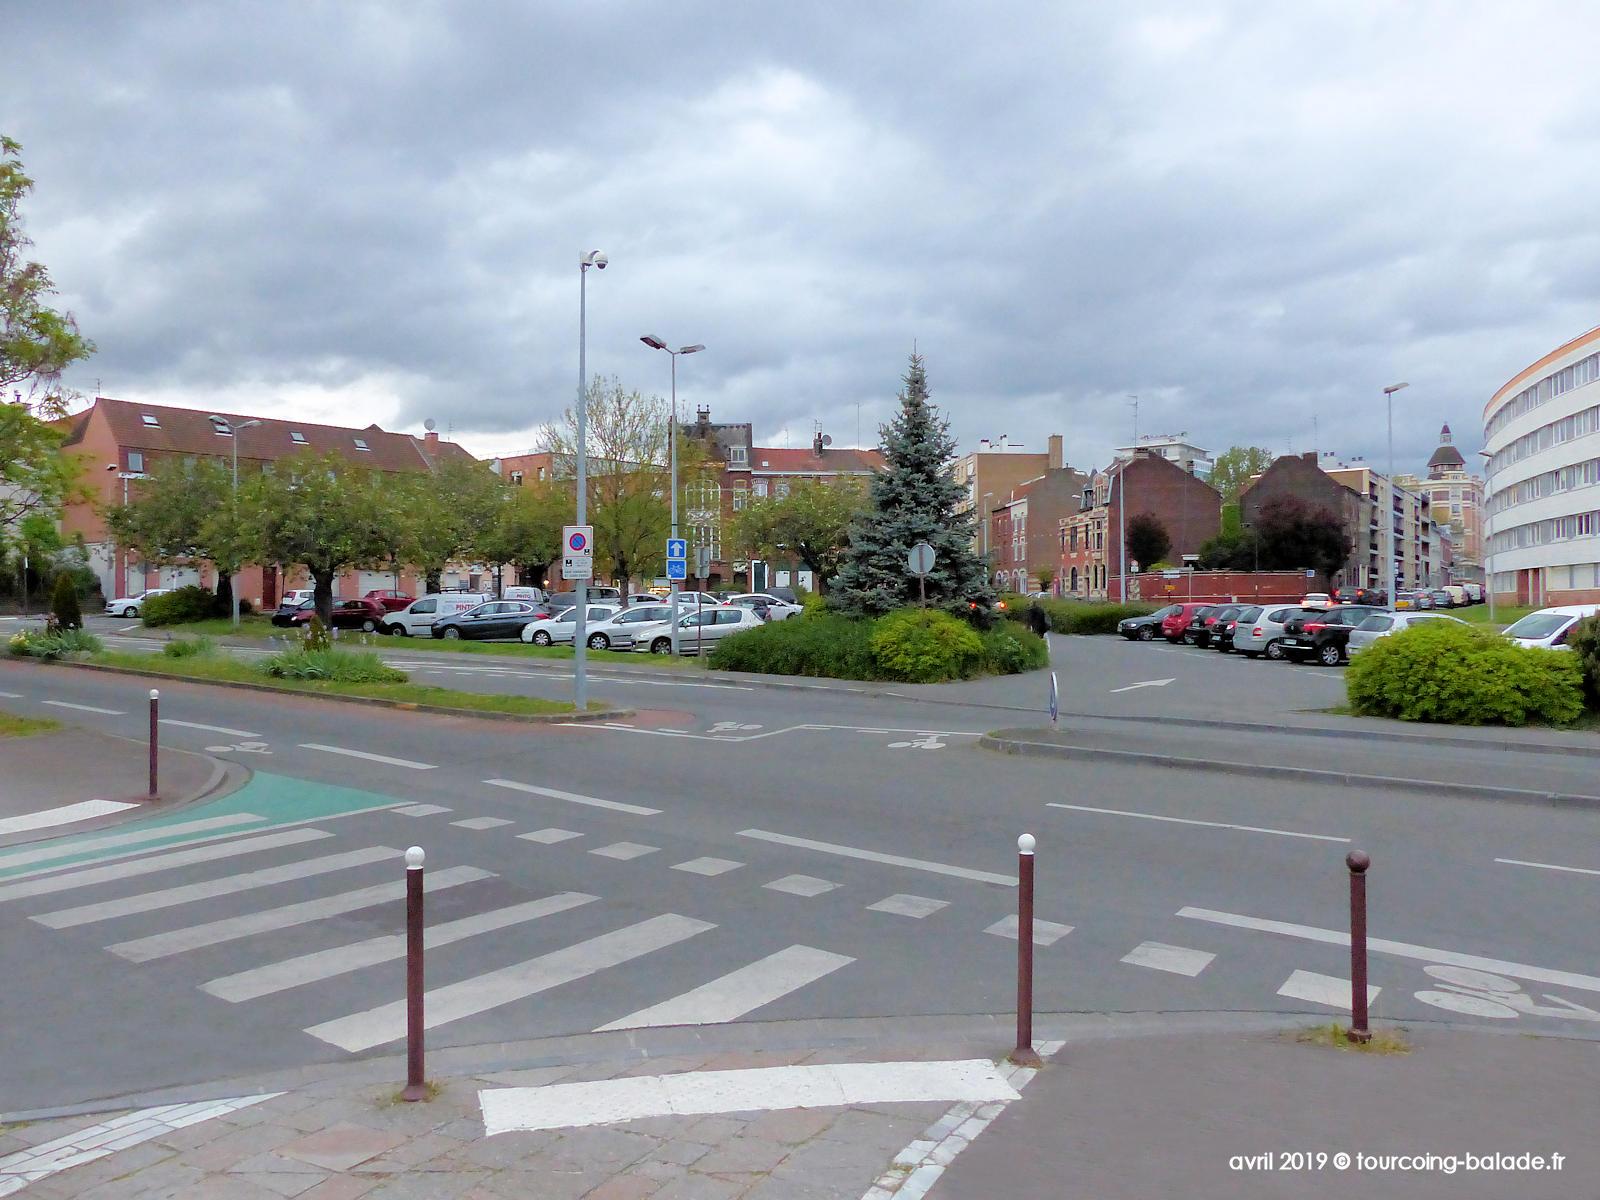 Parking Sébastopol, Tourcoing 2019